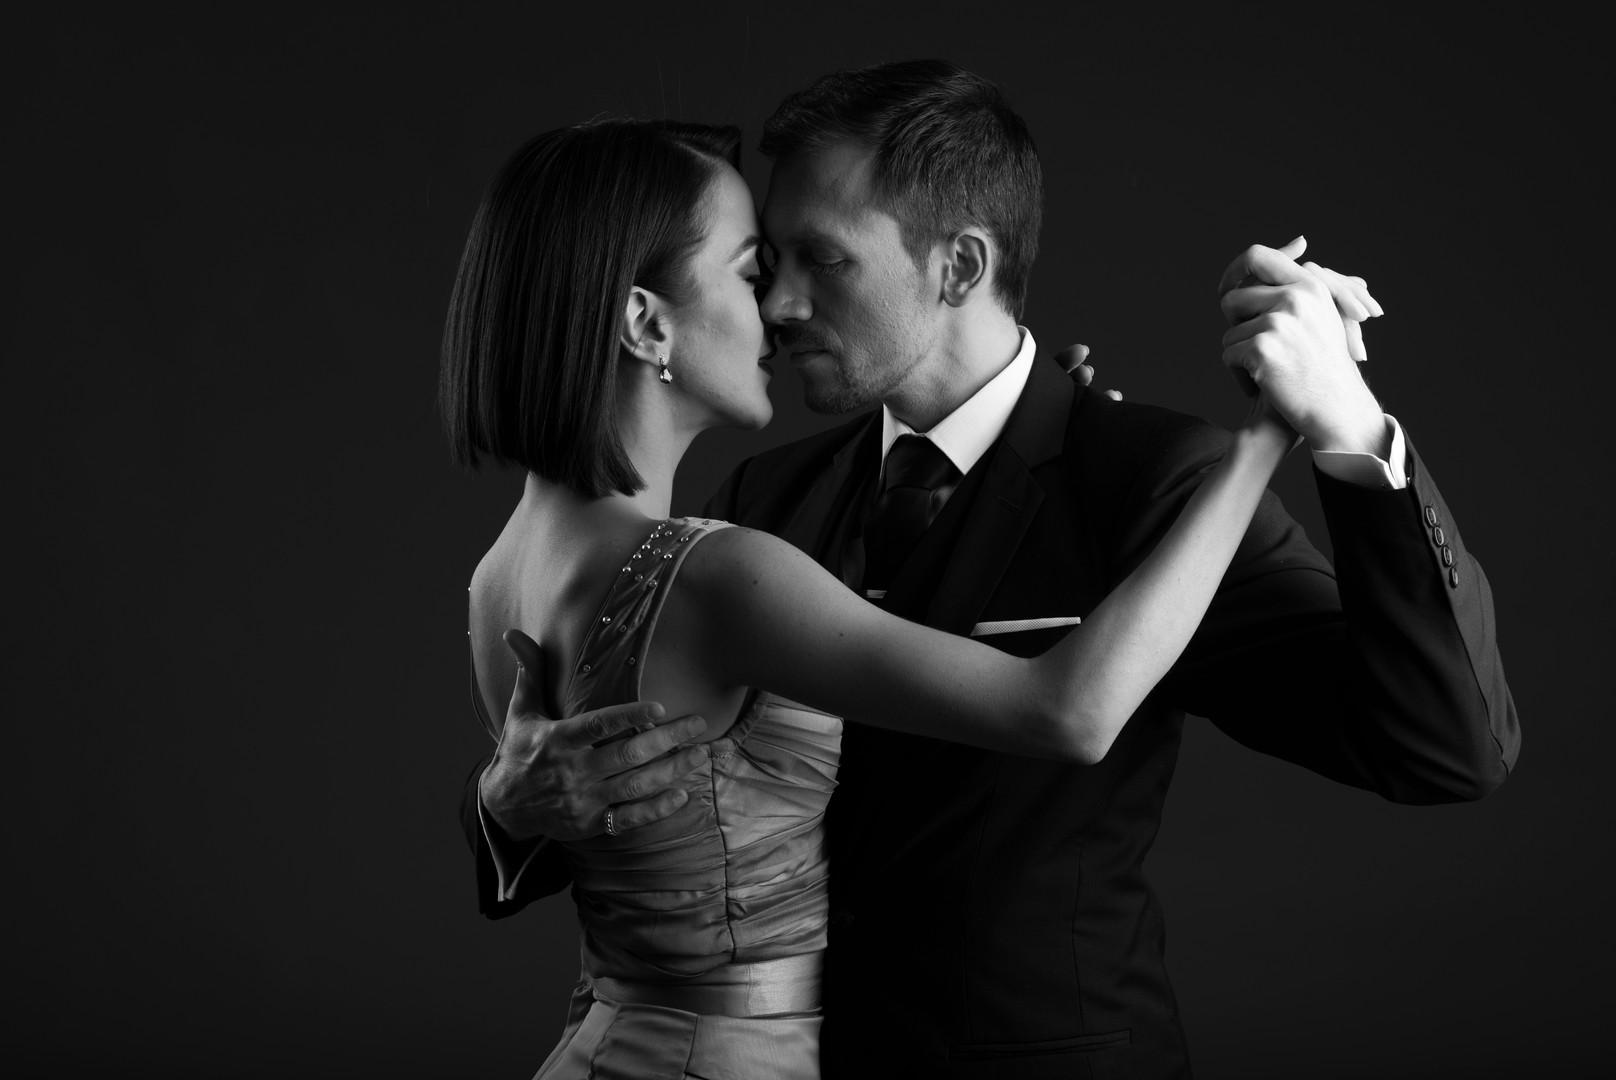 duo danseurs 3.jpg